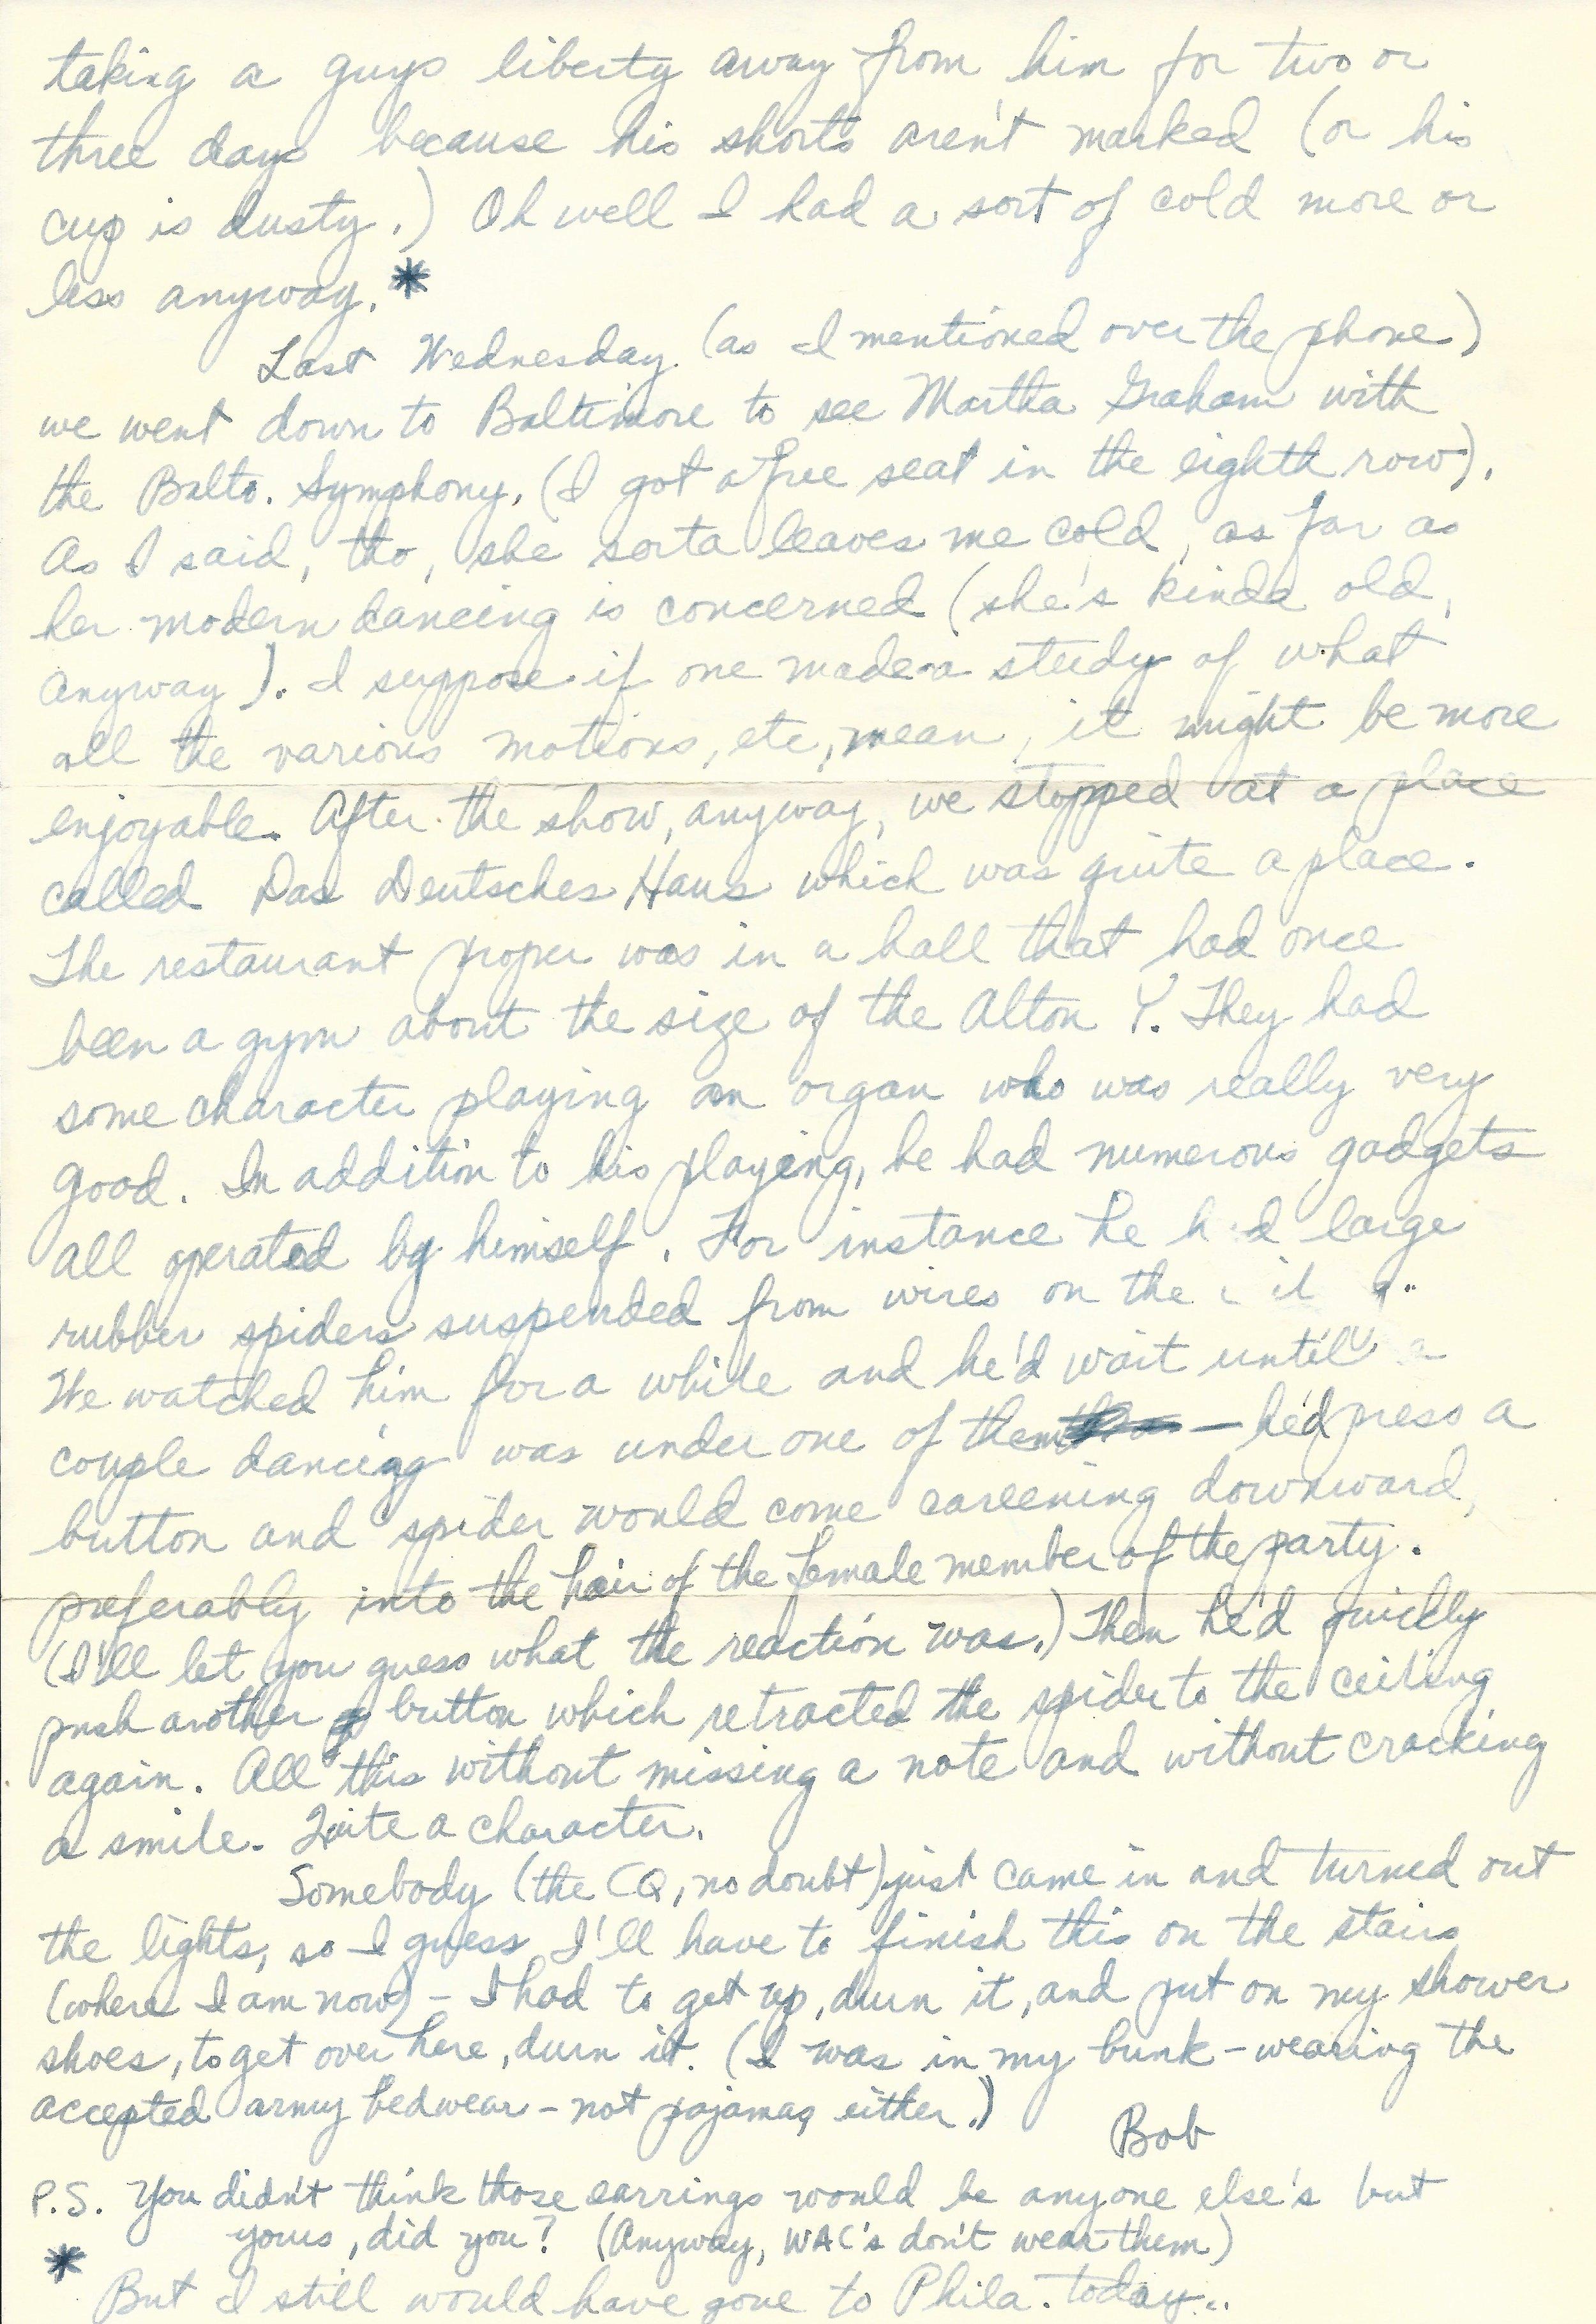 6. Feb. 8, 1953 (Opa)_Page_4.jpg